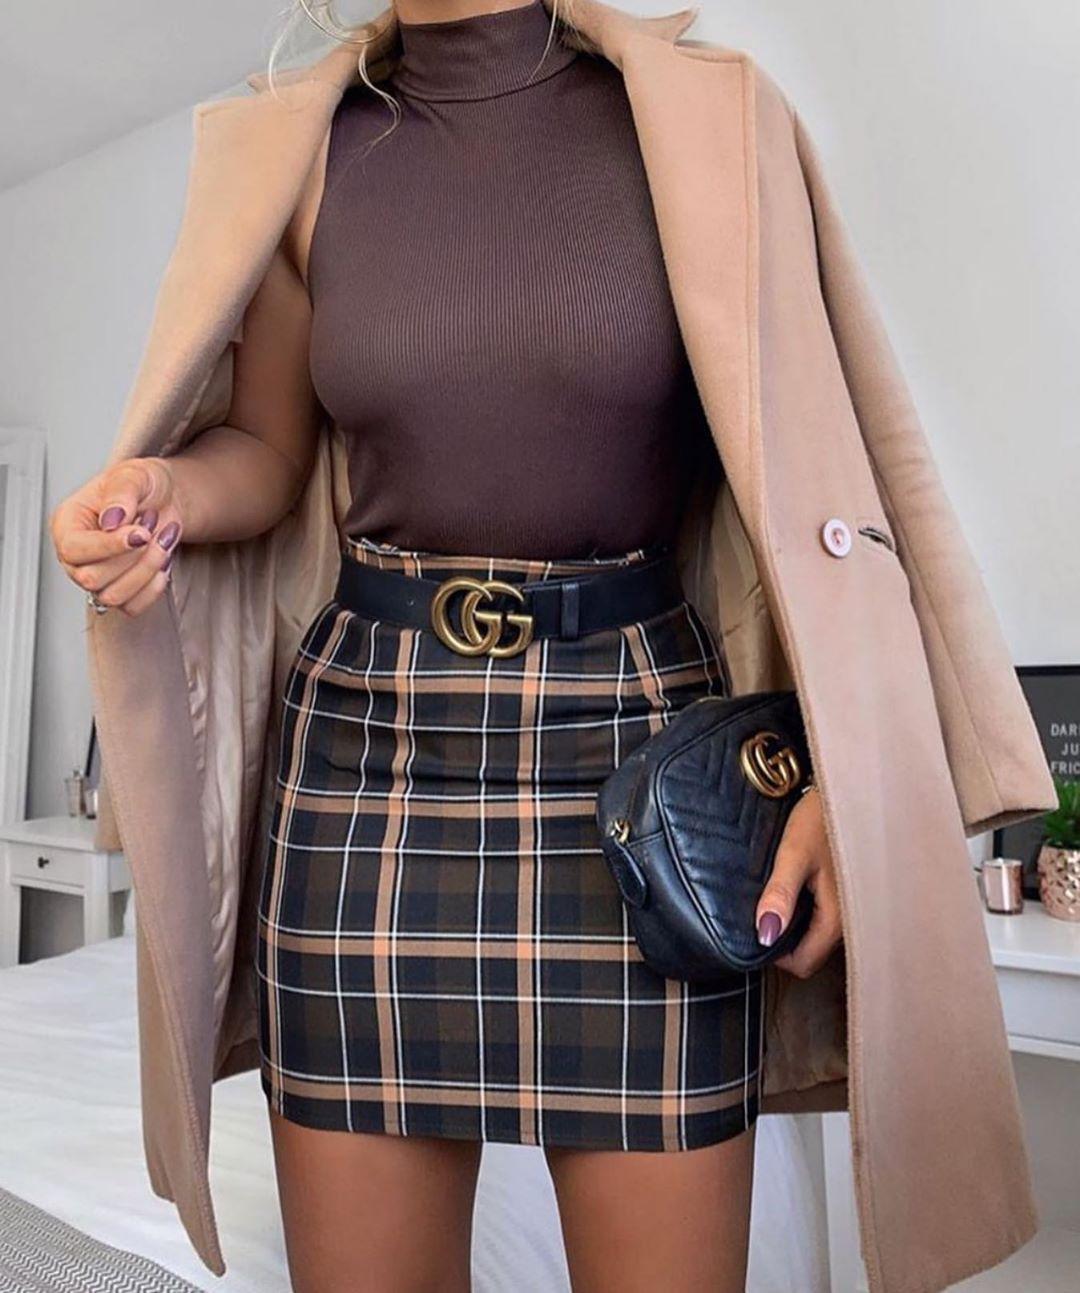 Gucci Belt – Luxury Fashion Leather Belt